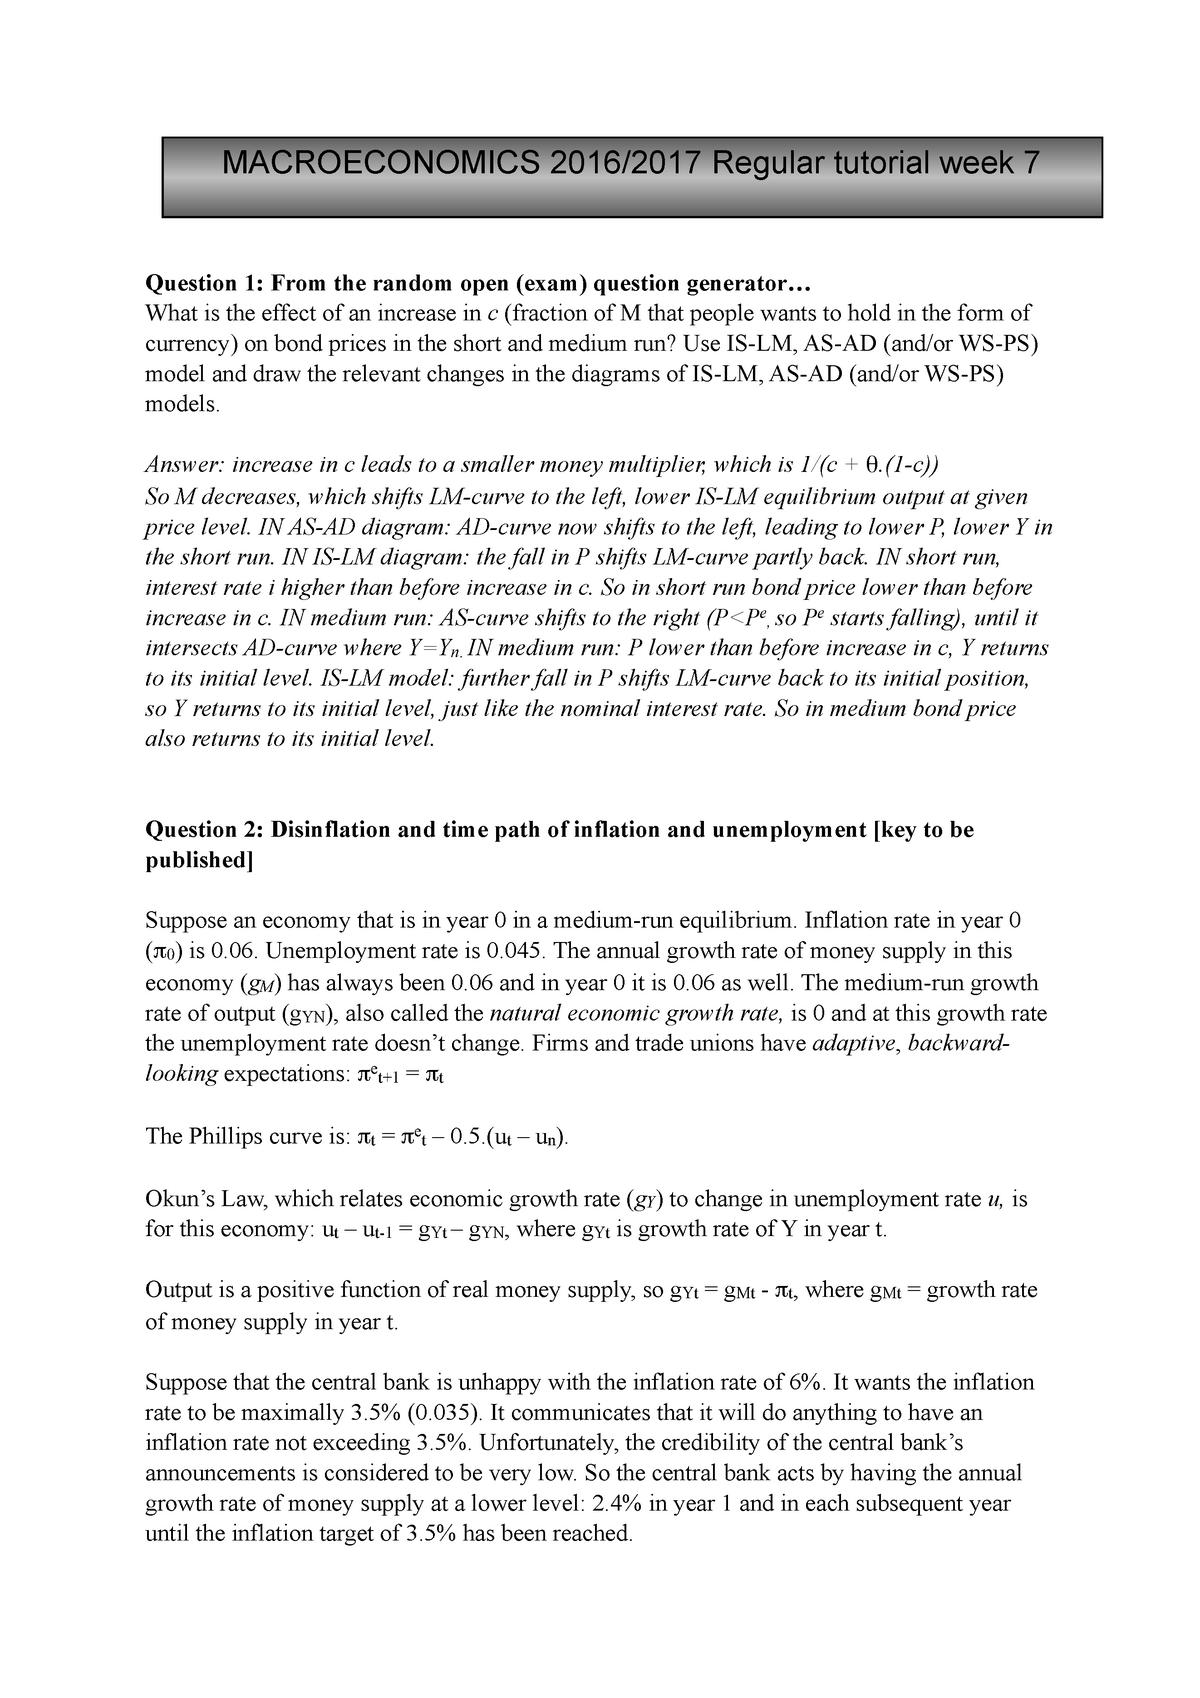 Tutorial 7 - Week 7 - ECB1MACR: Macroeconomics, A European